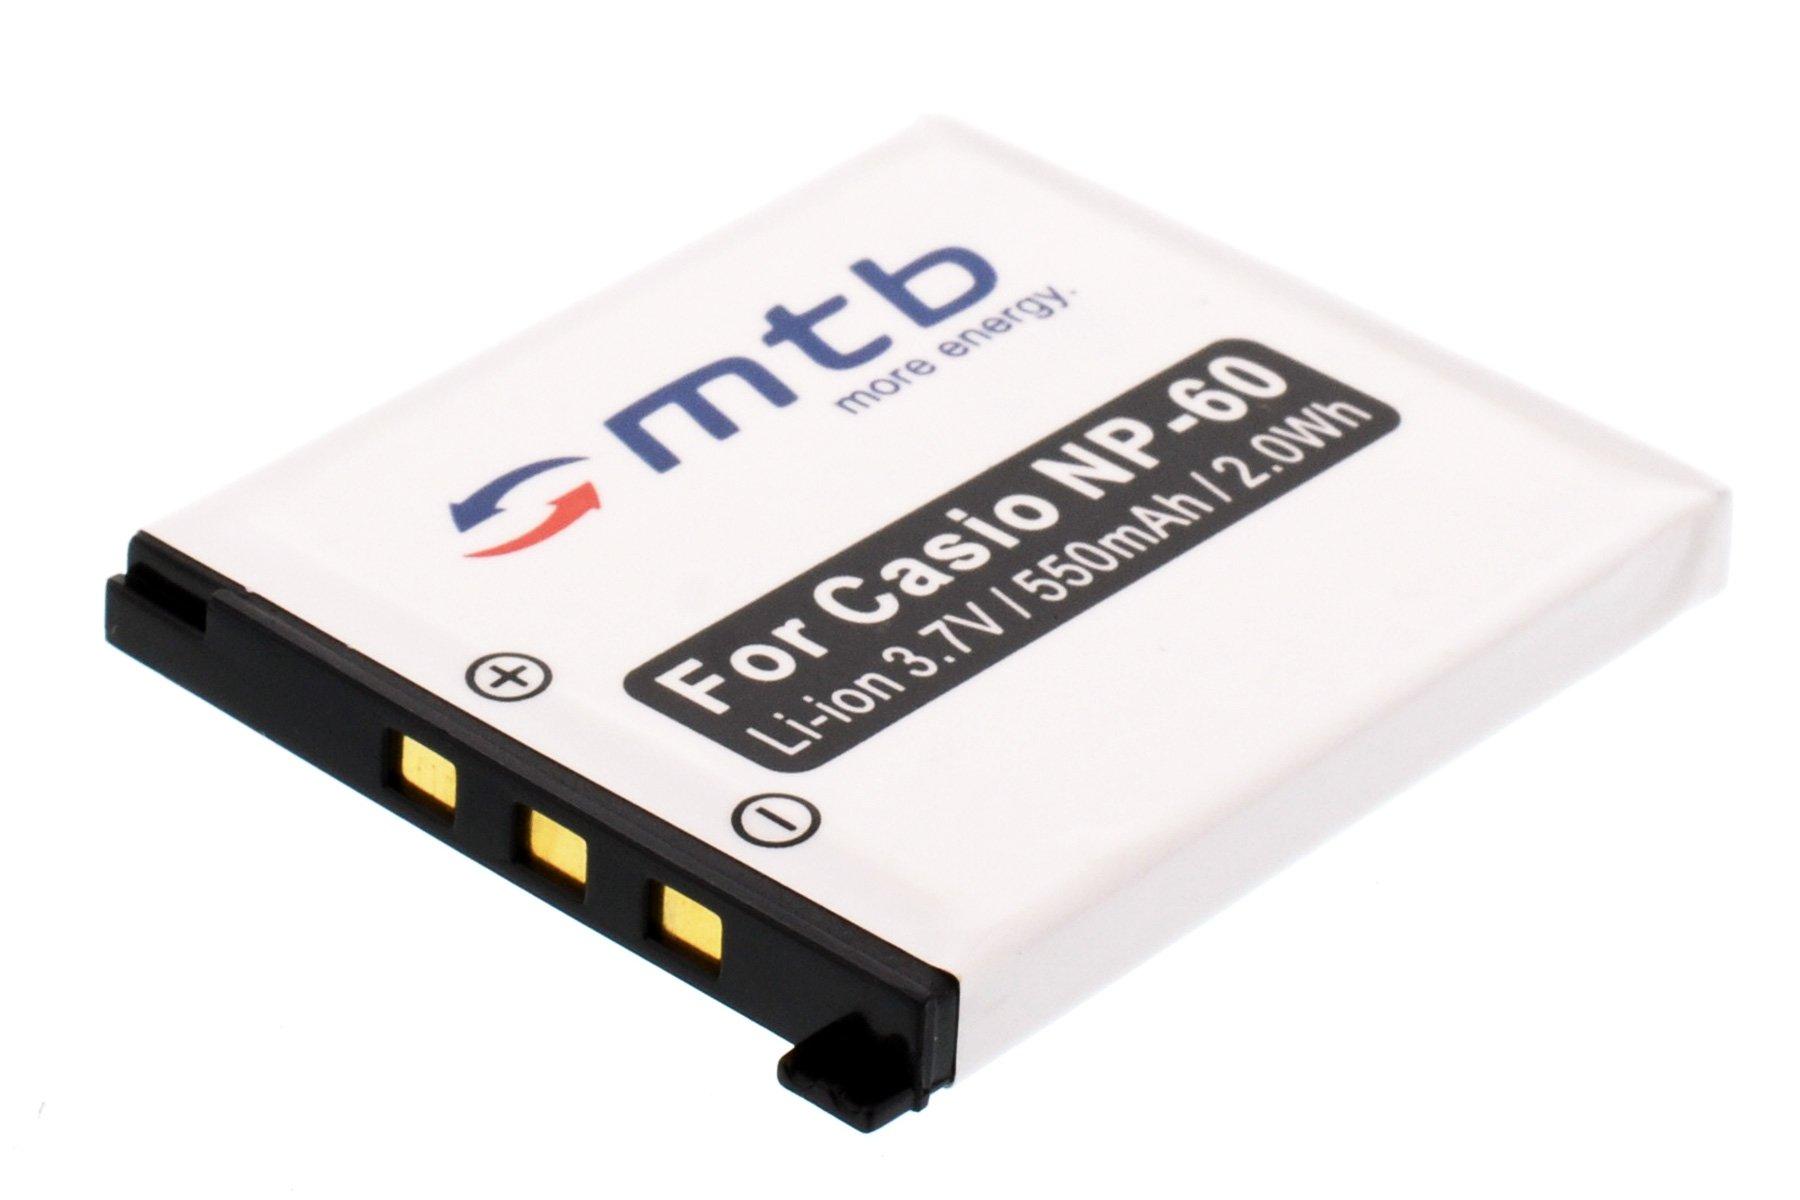 NP-60 para Casio Exilim EX-FS10 S10 S12 Z9 Z19 Z22 Z25.Ver Lista Cargador USB//Coche//Corriente Bater/ìa